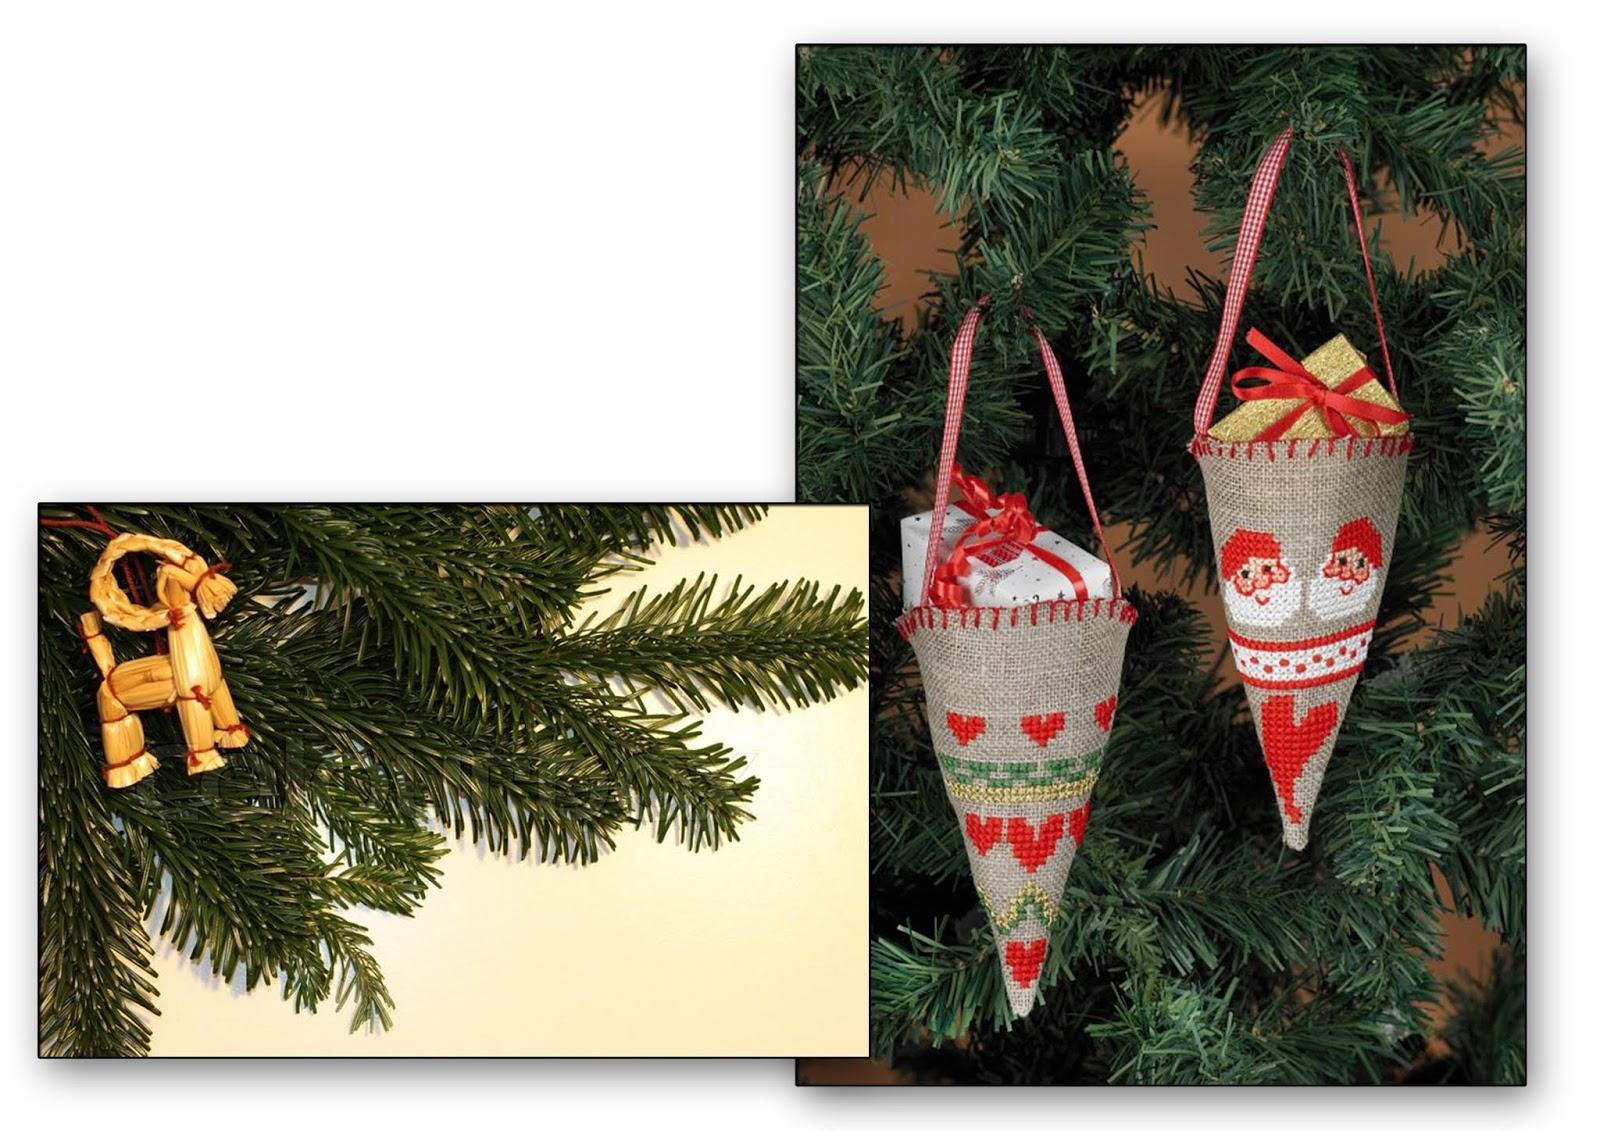 Julebuk i Kræmmerhus duńskie ozdoby świąteczne